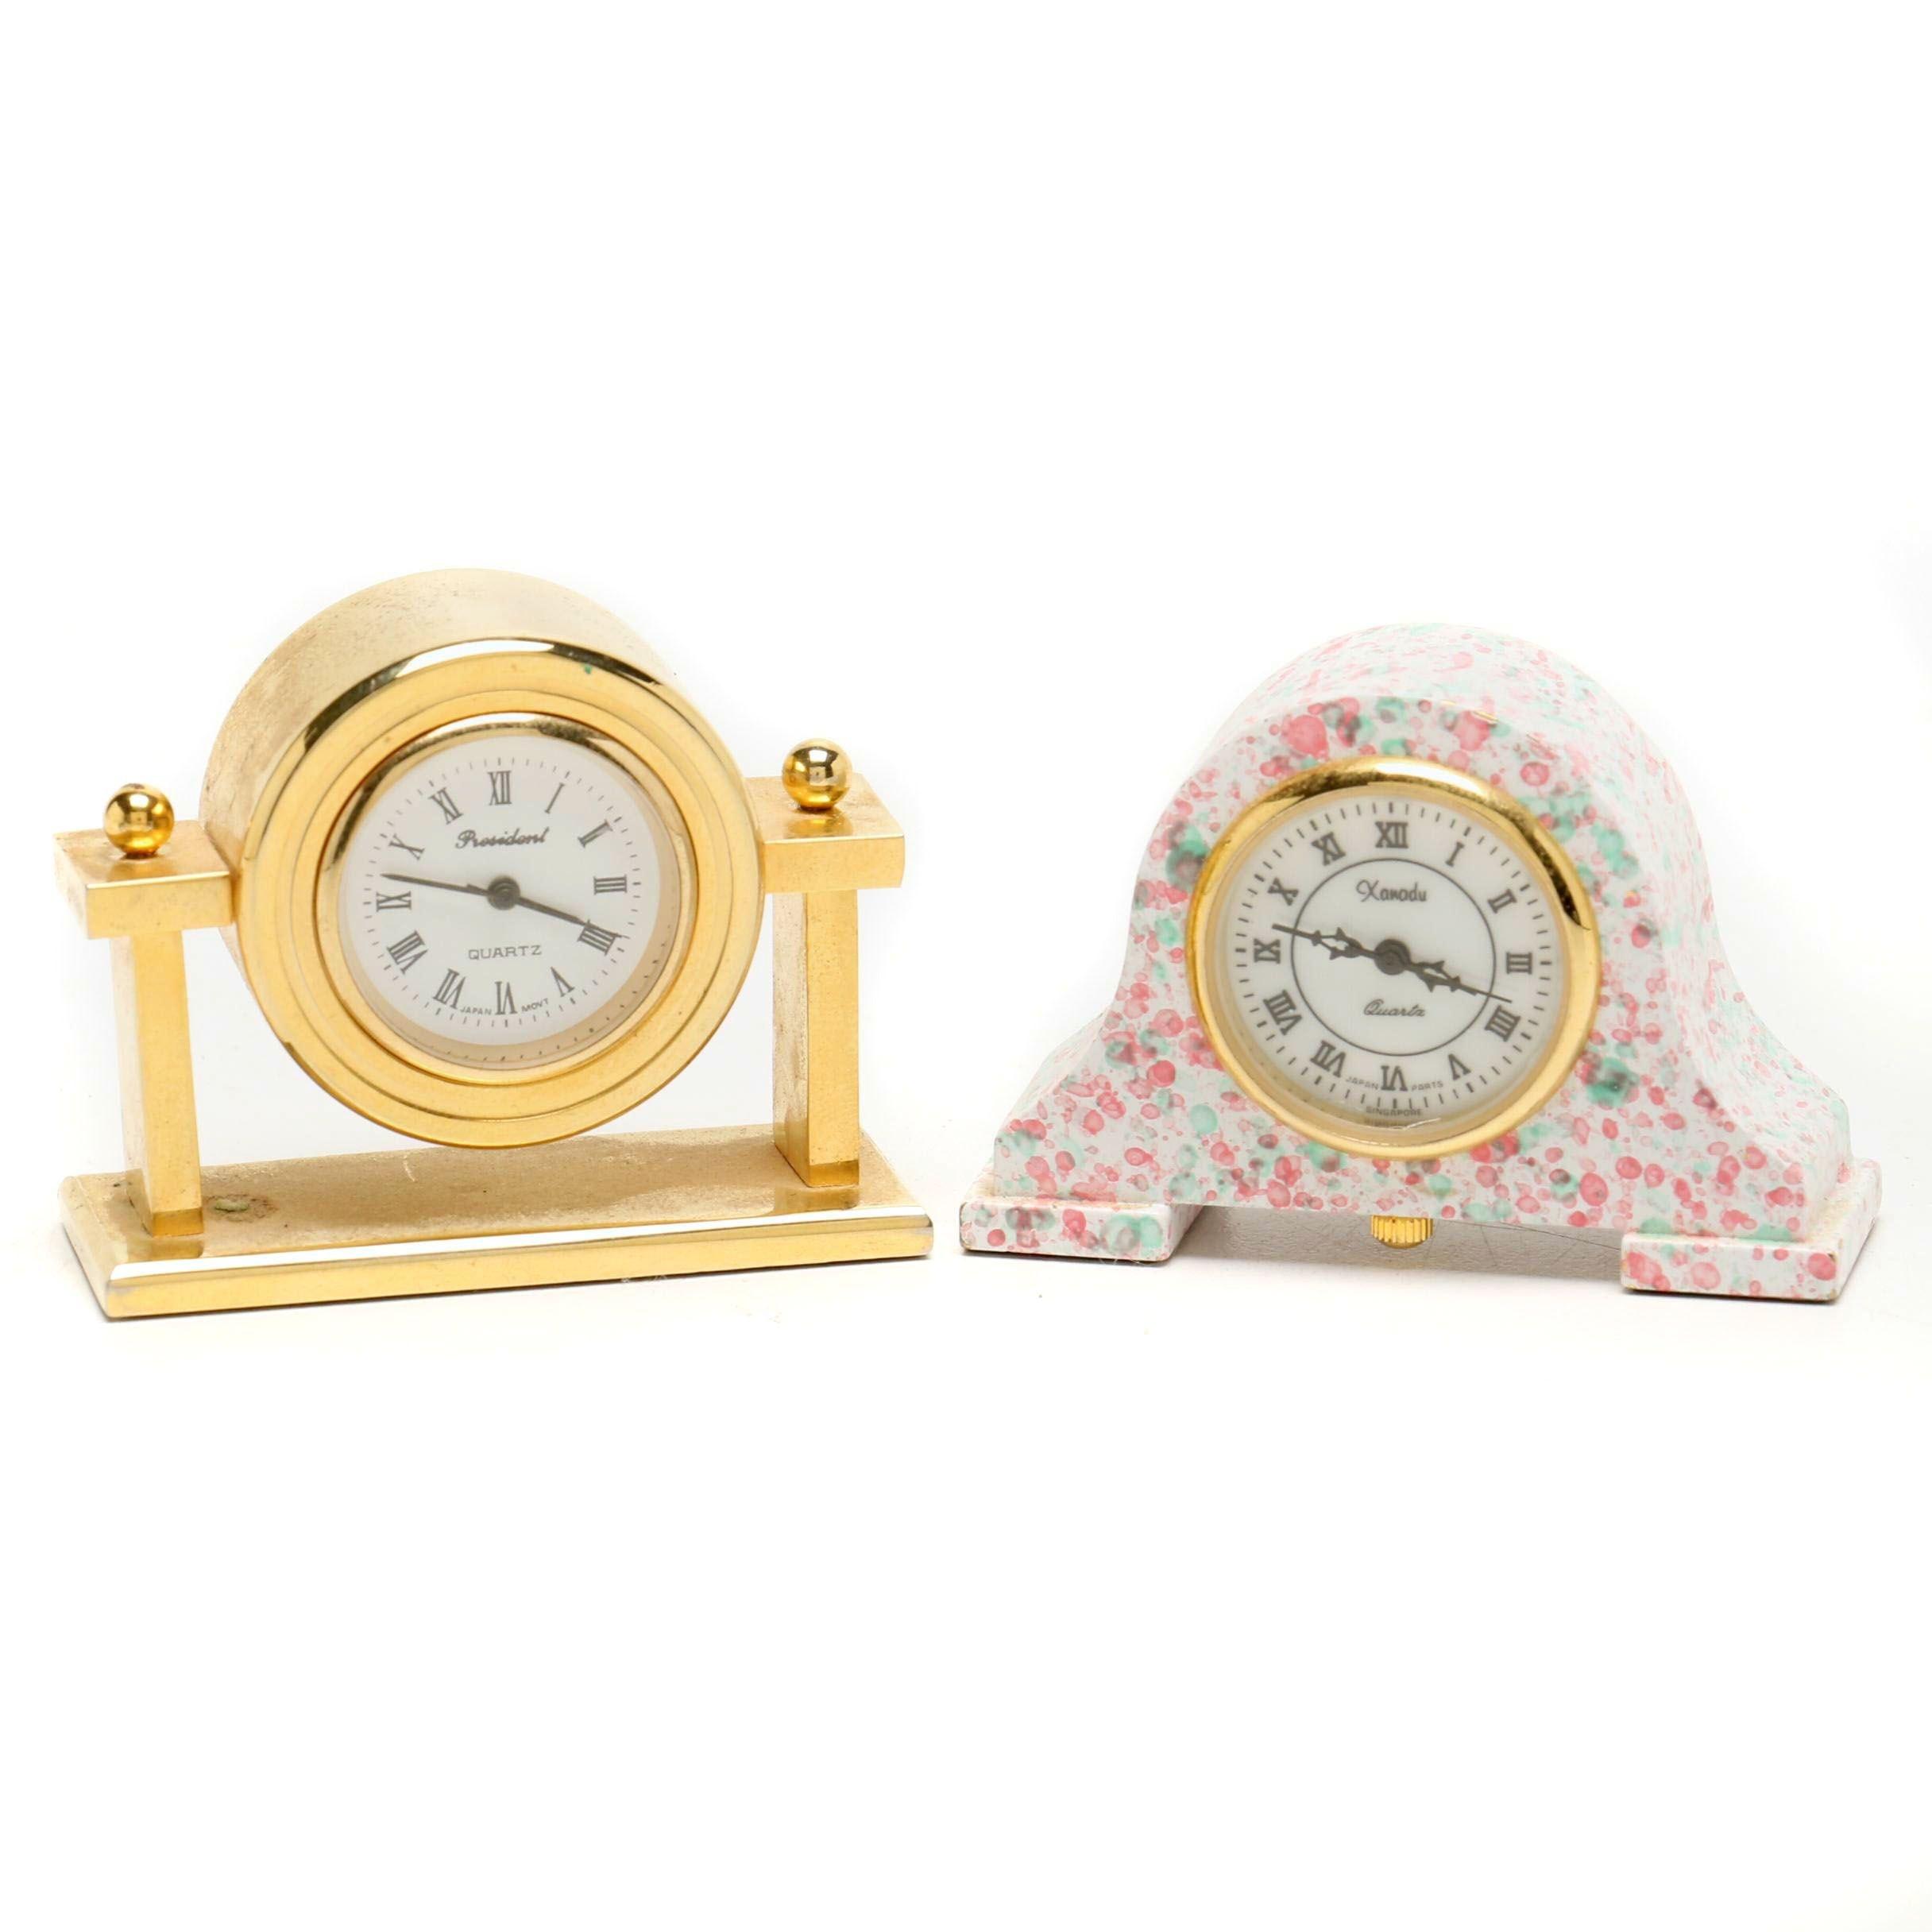 Miniature Desk or Dresser Clocks